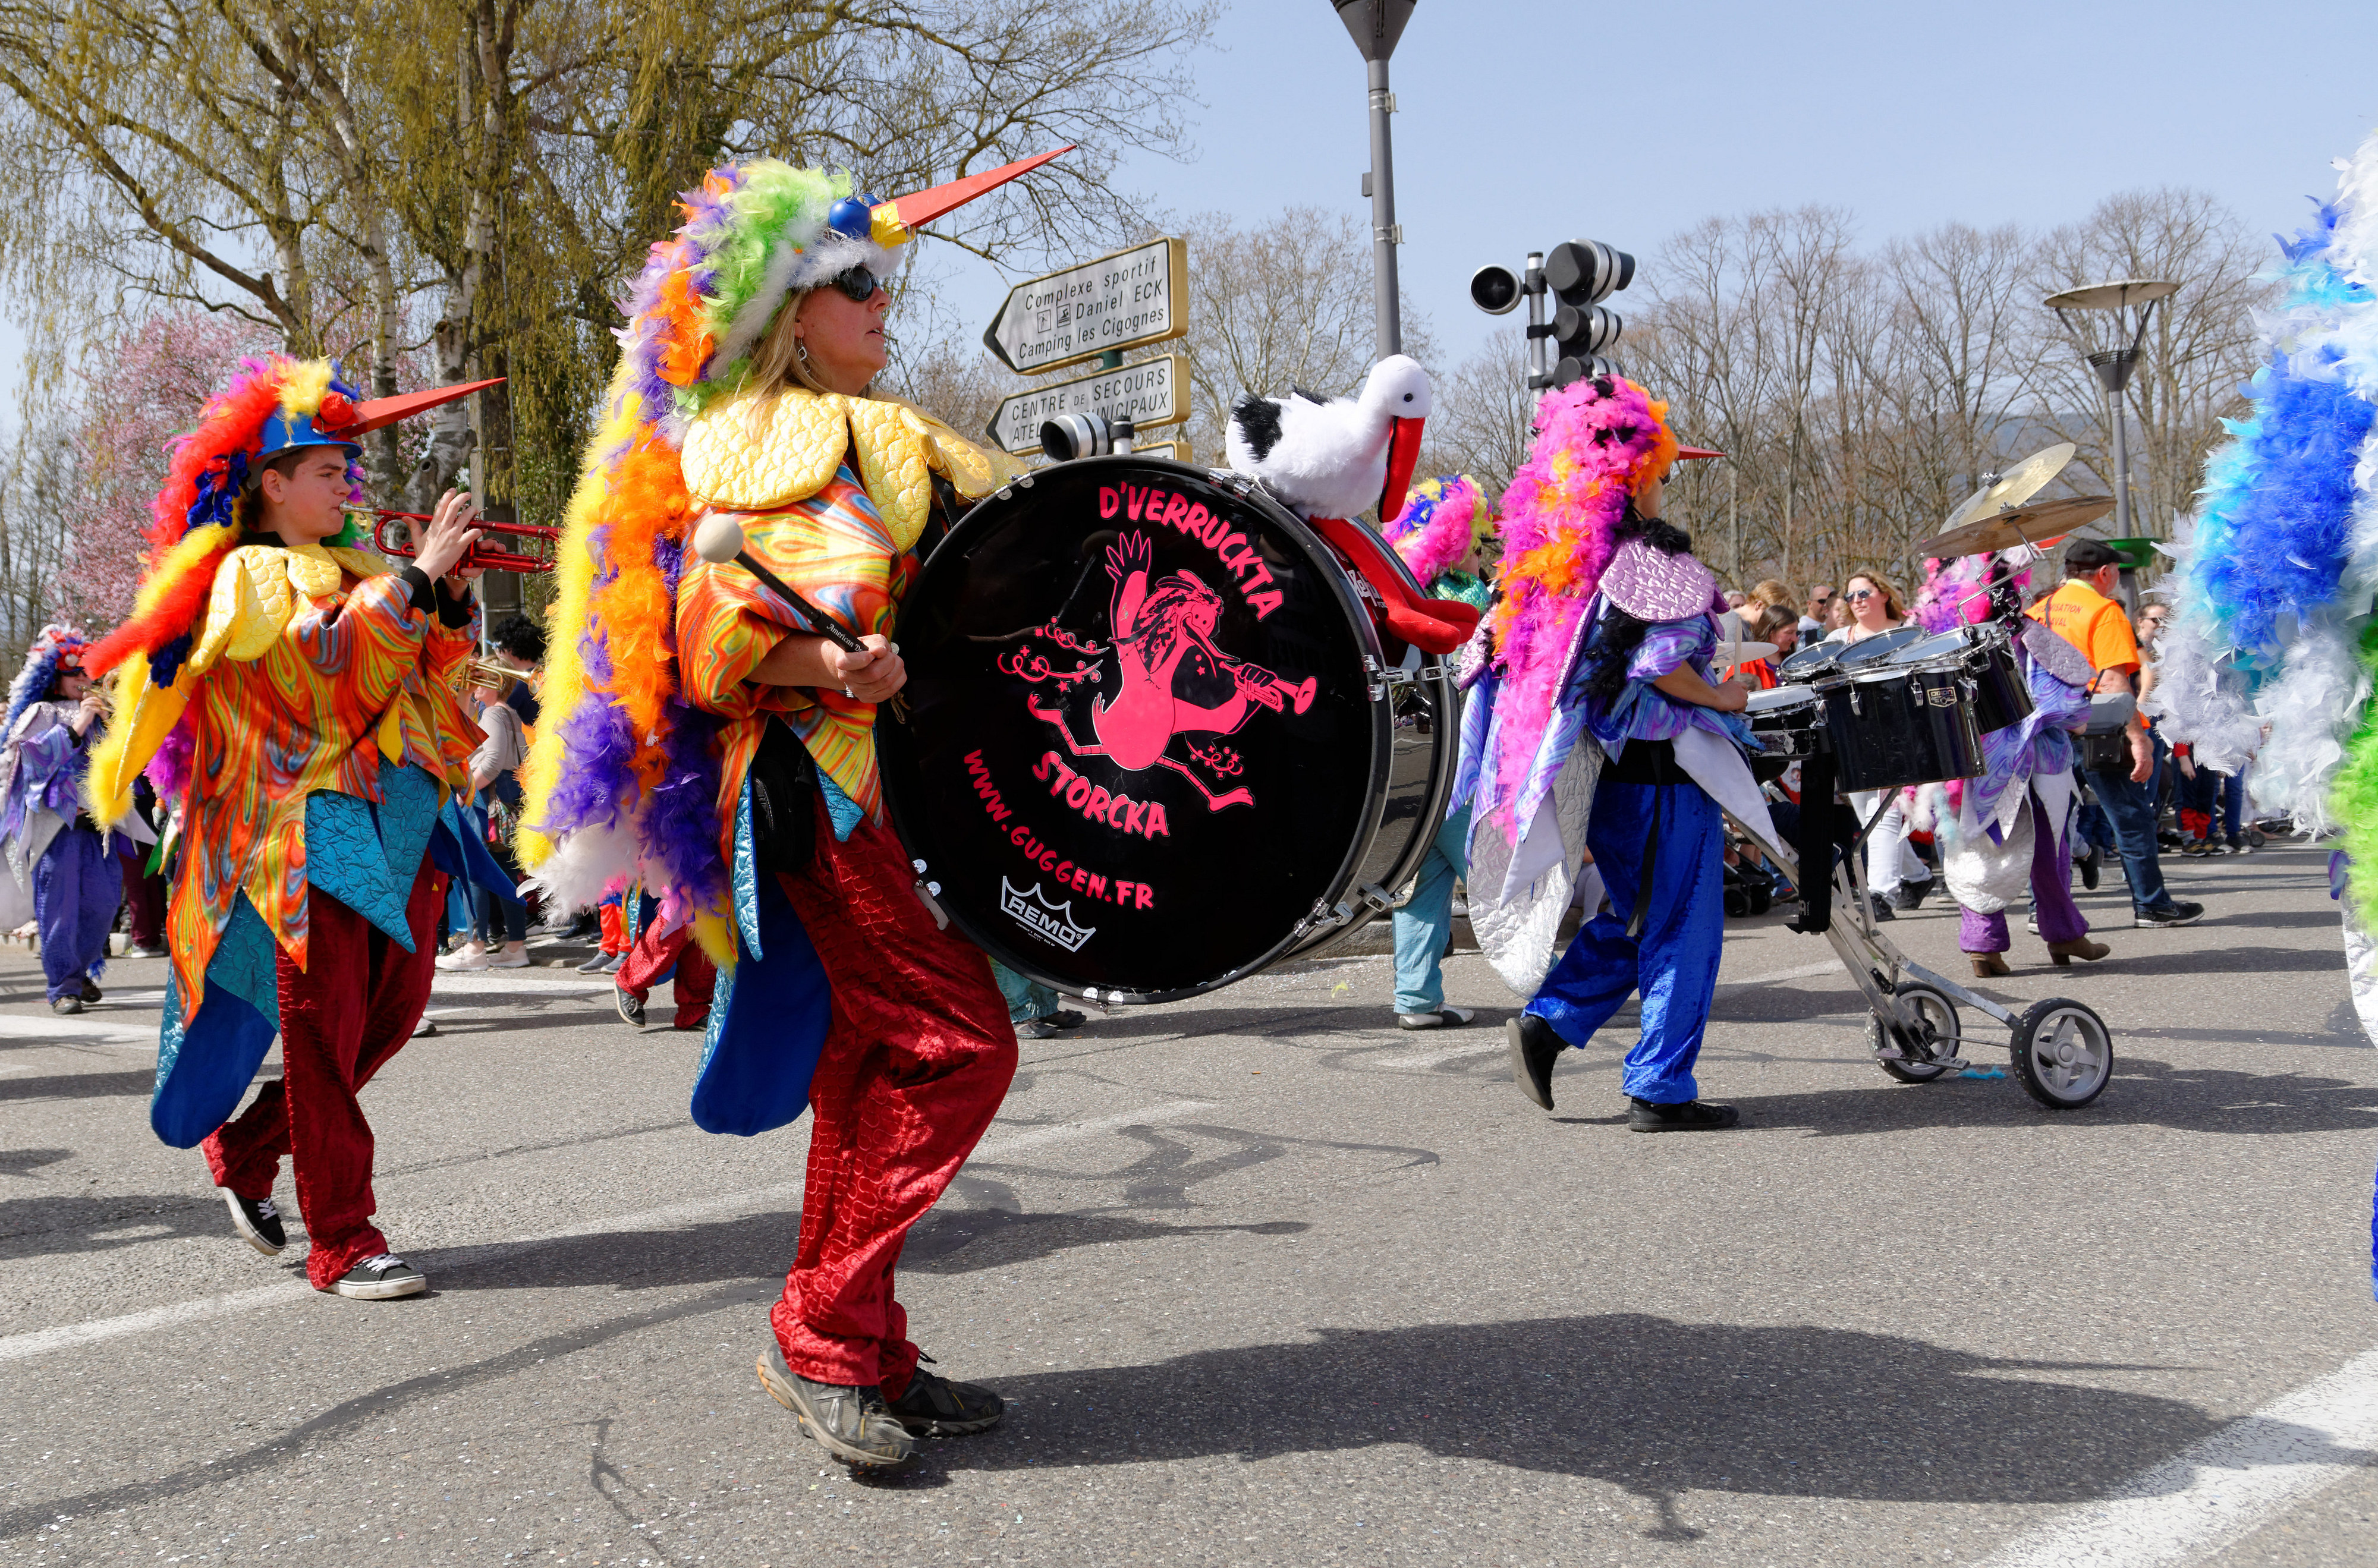 File2018 04 08 14 43 09 Carnaval Cernayjpg Wikimedia Commons